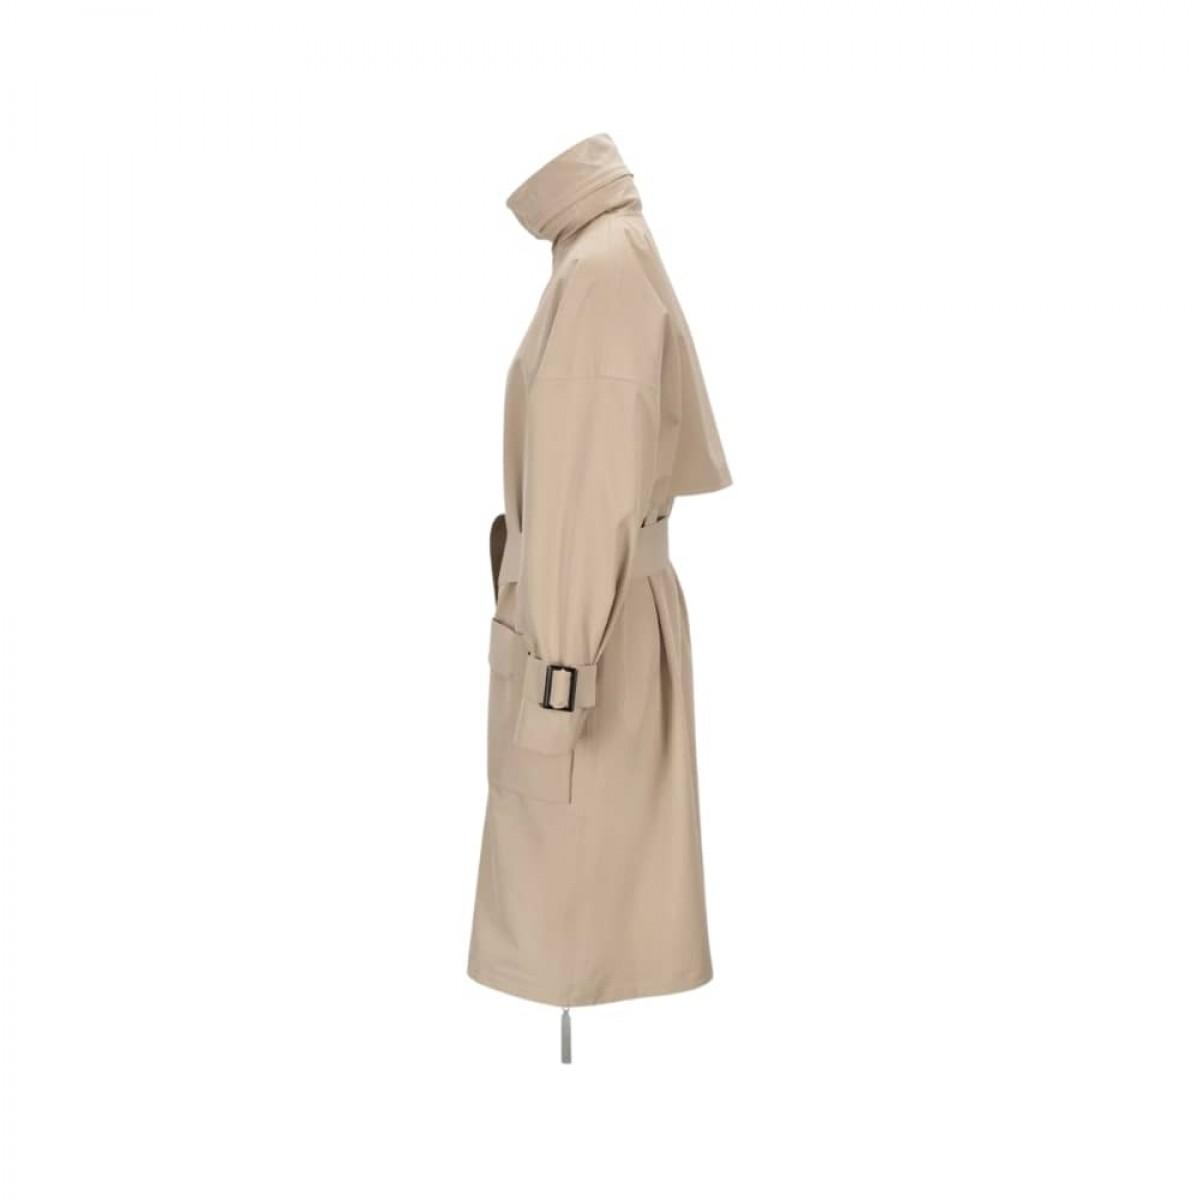 brosundet regn frakke - beige - fra siden